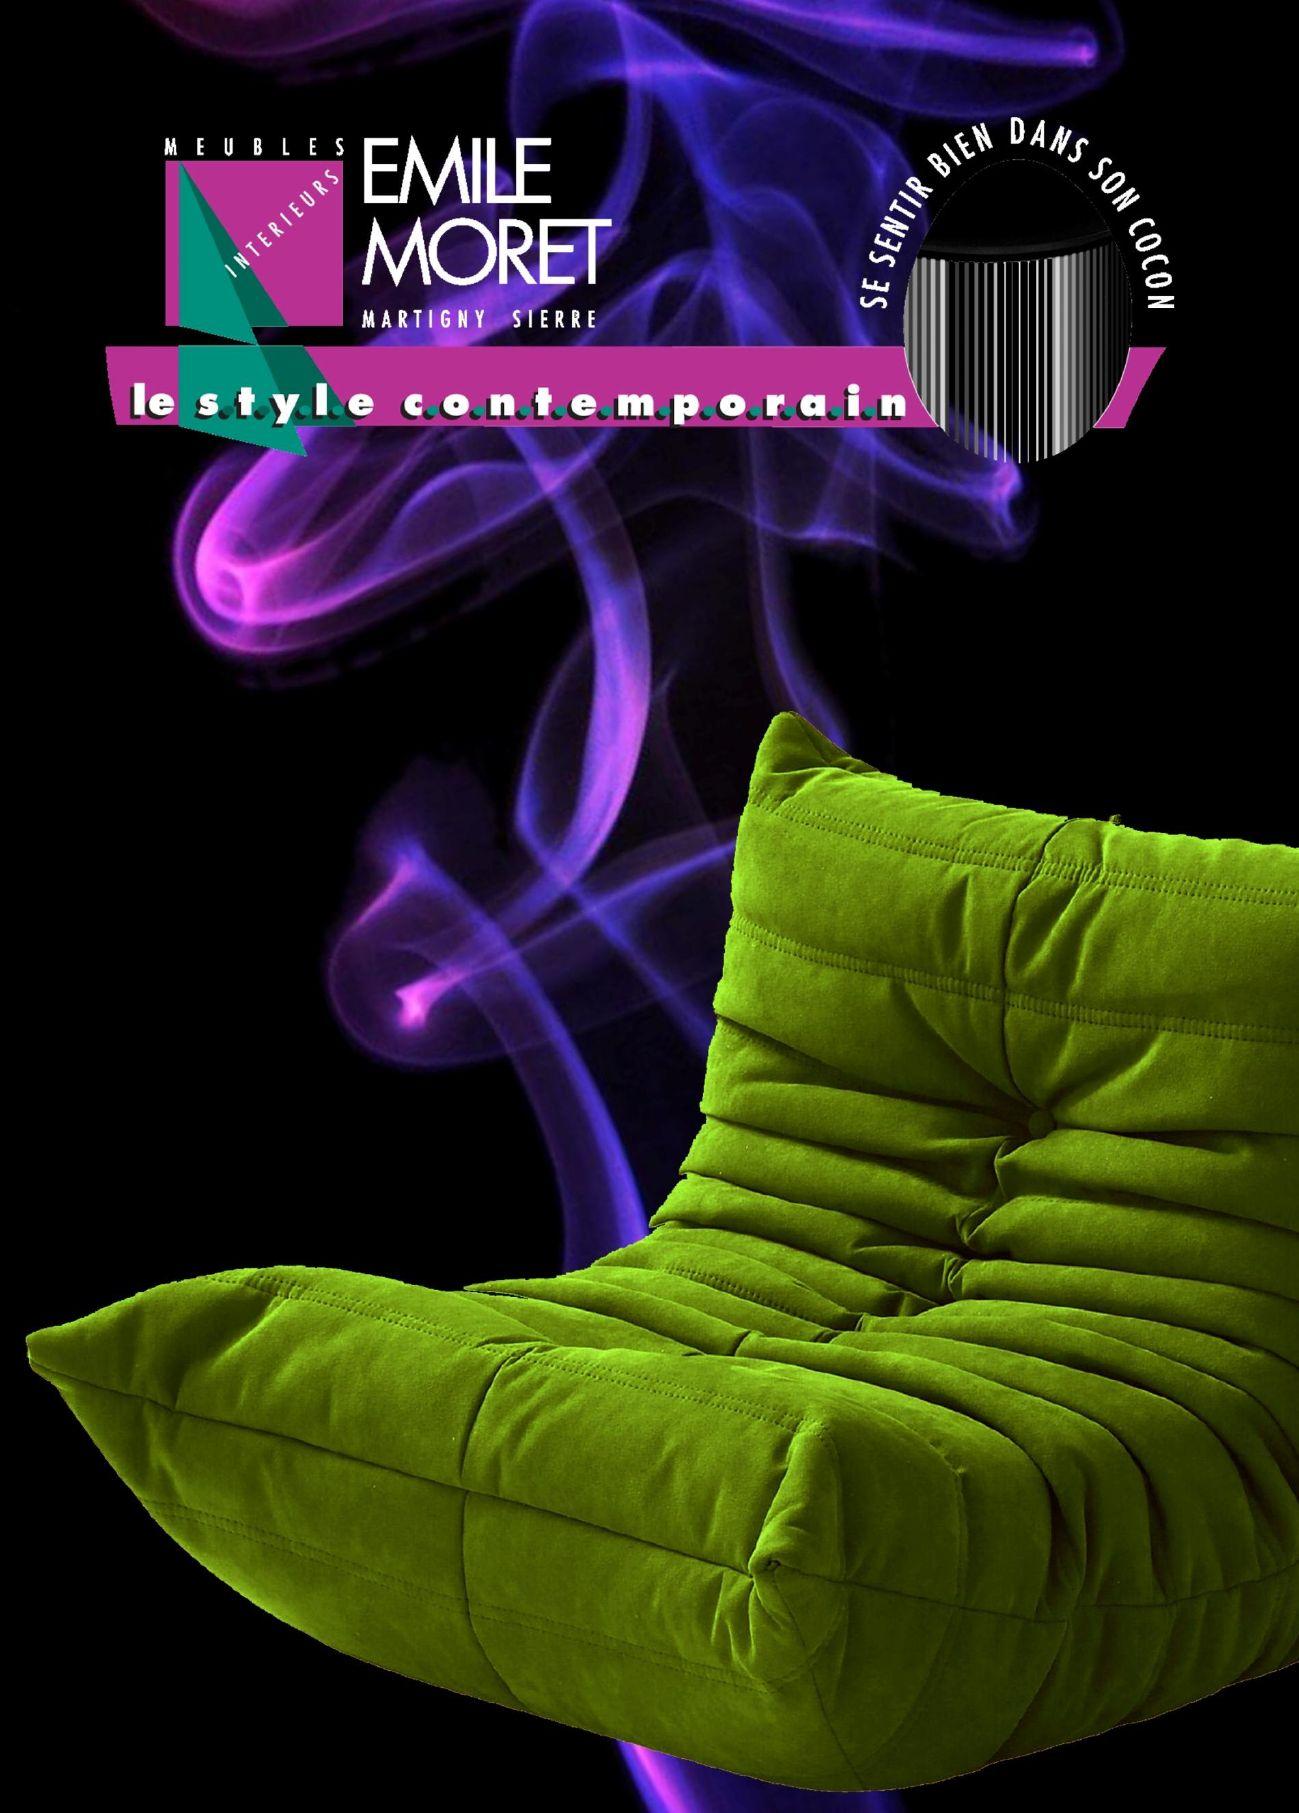 catalogue emile moret meubles by sbastien moret issuu